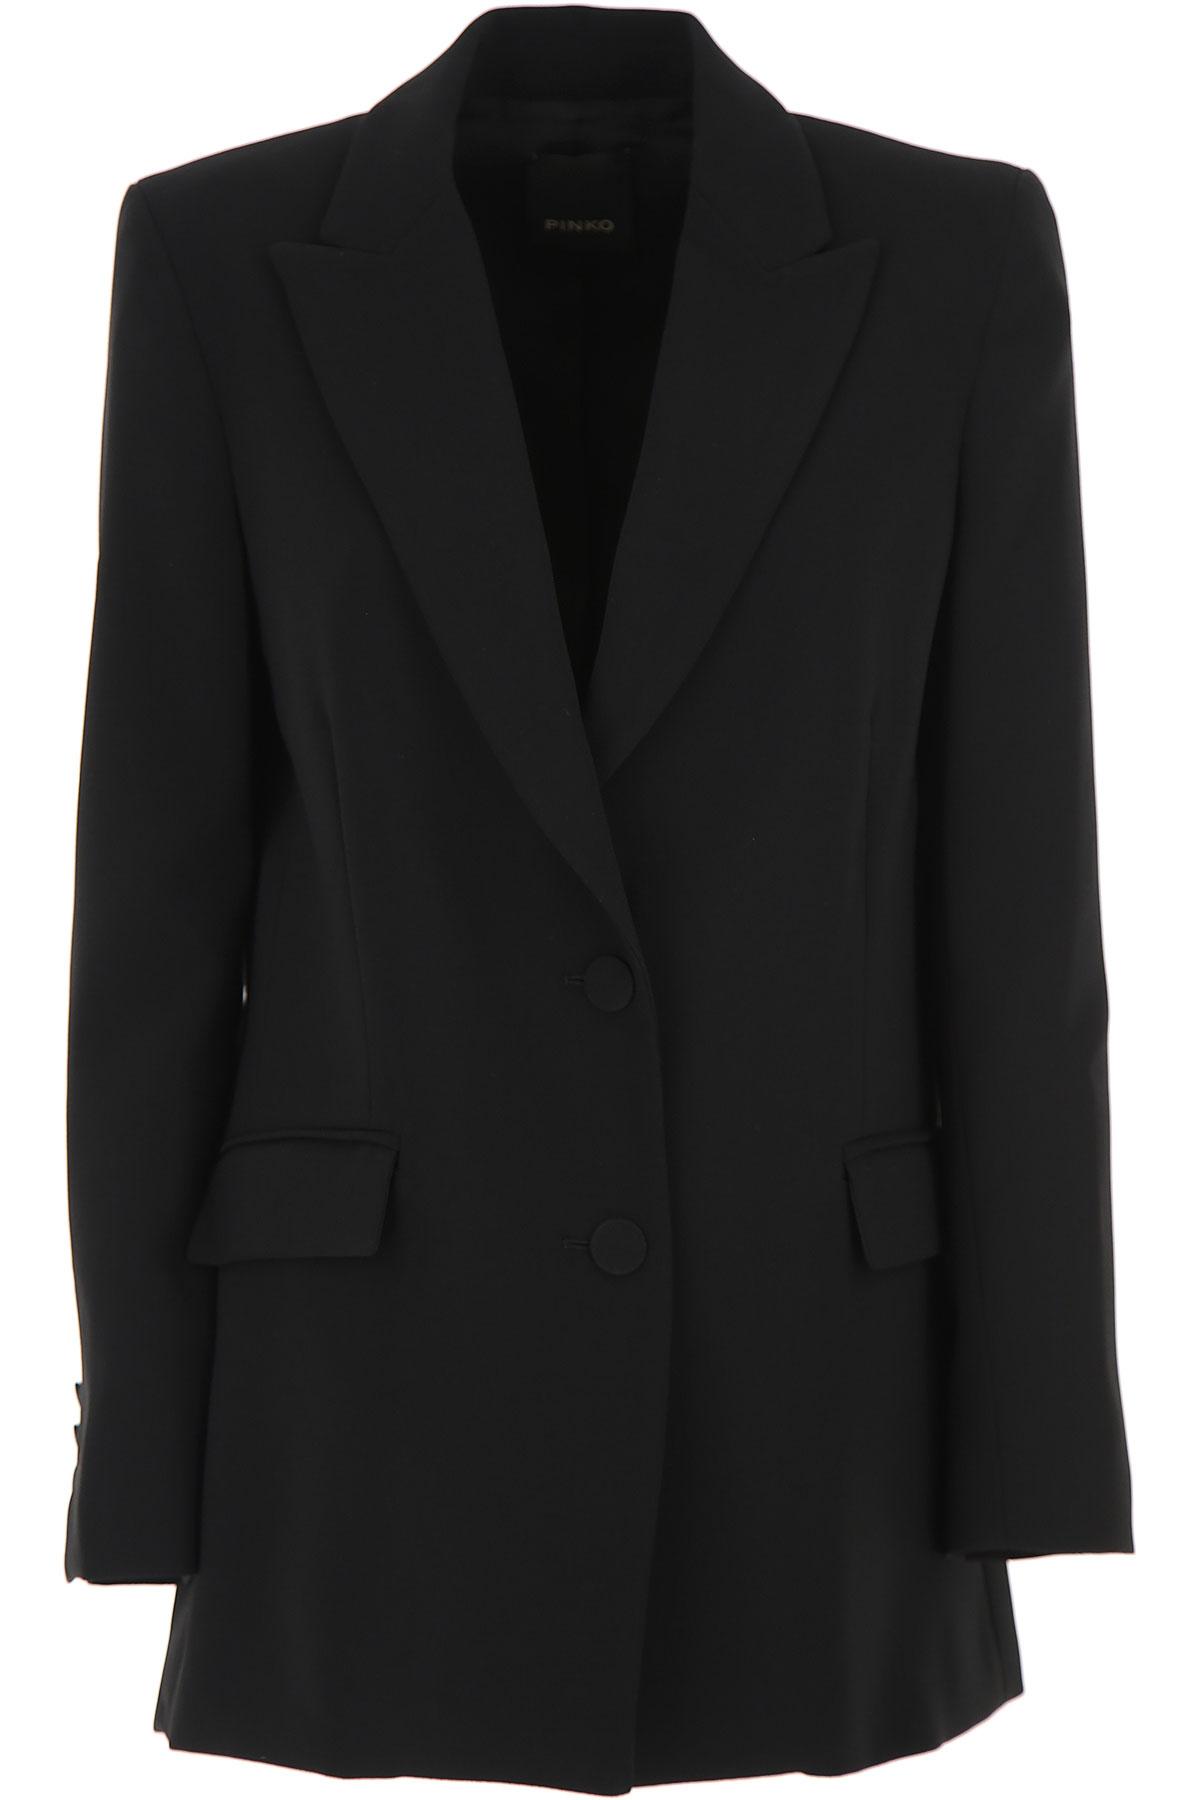 Pinko Blazer for Women On Sale, Black, polyestere, 2019, 4 6